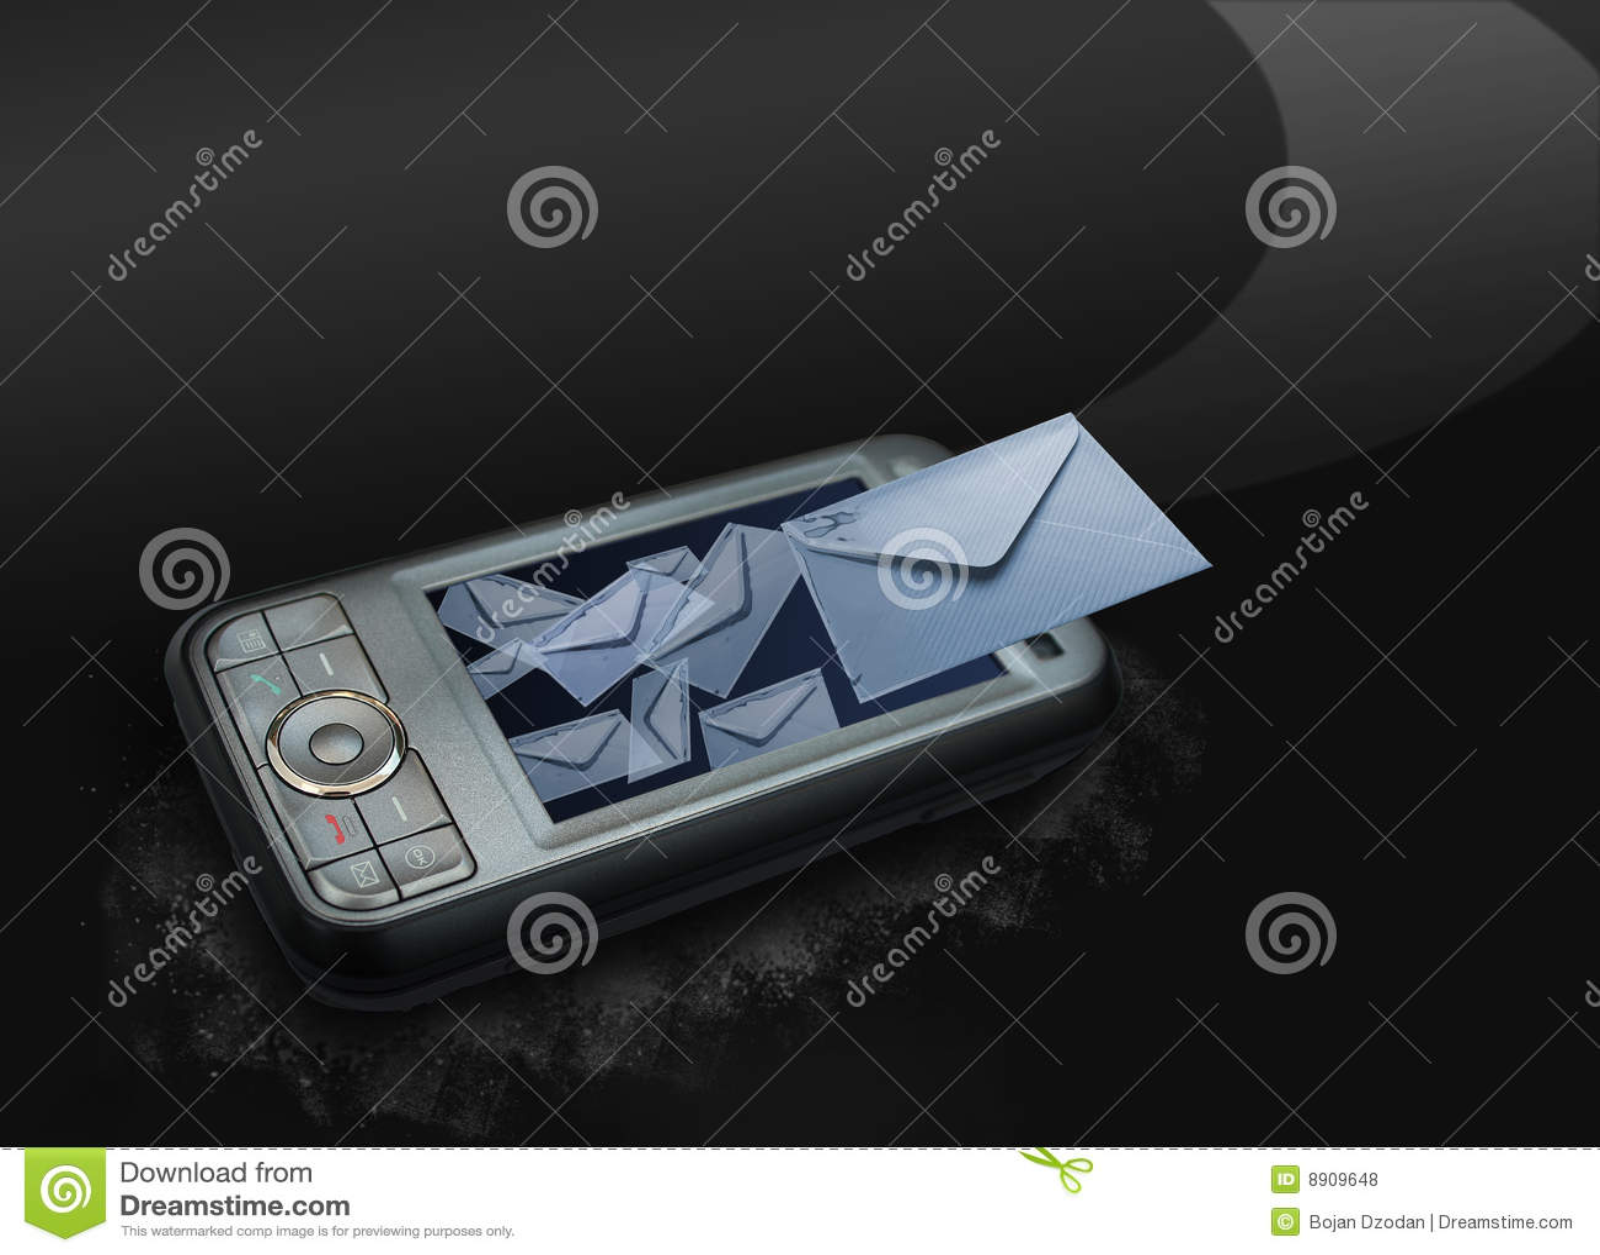 Móvil que envía mensajes